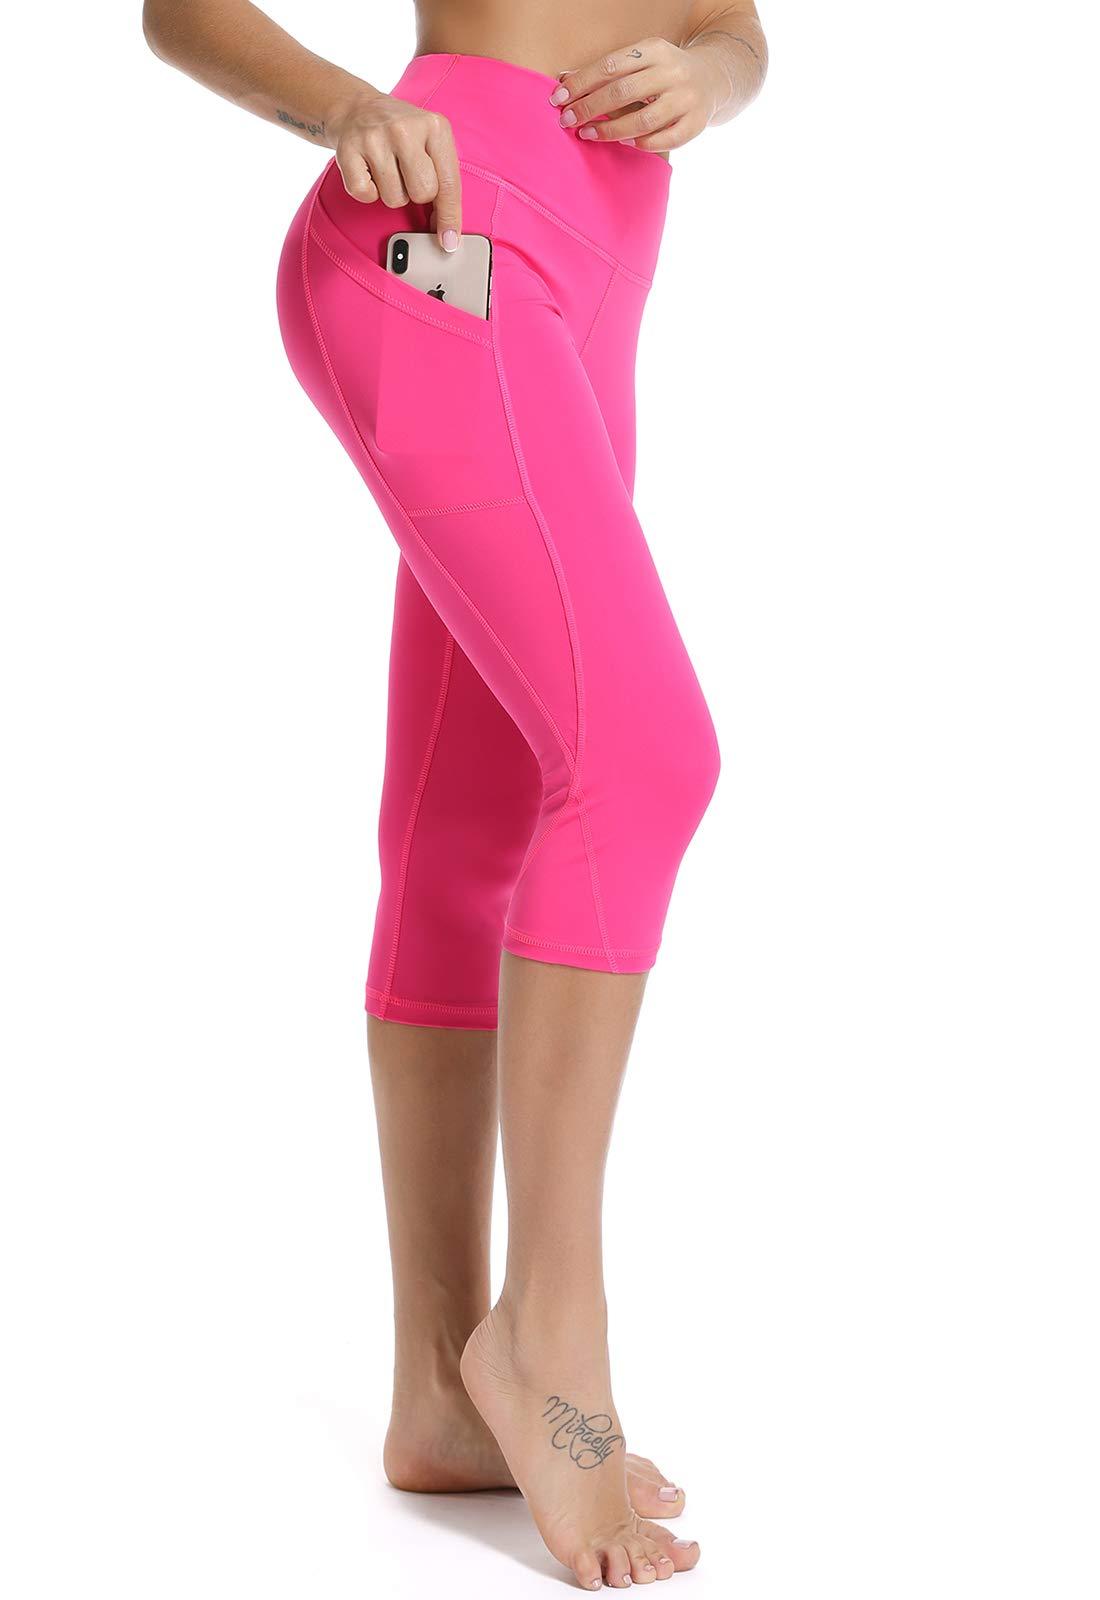 FITTOO Women's Yoga Capris Leggings Pockets Workout Pants